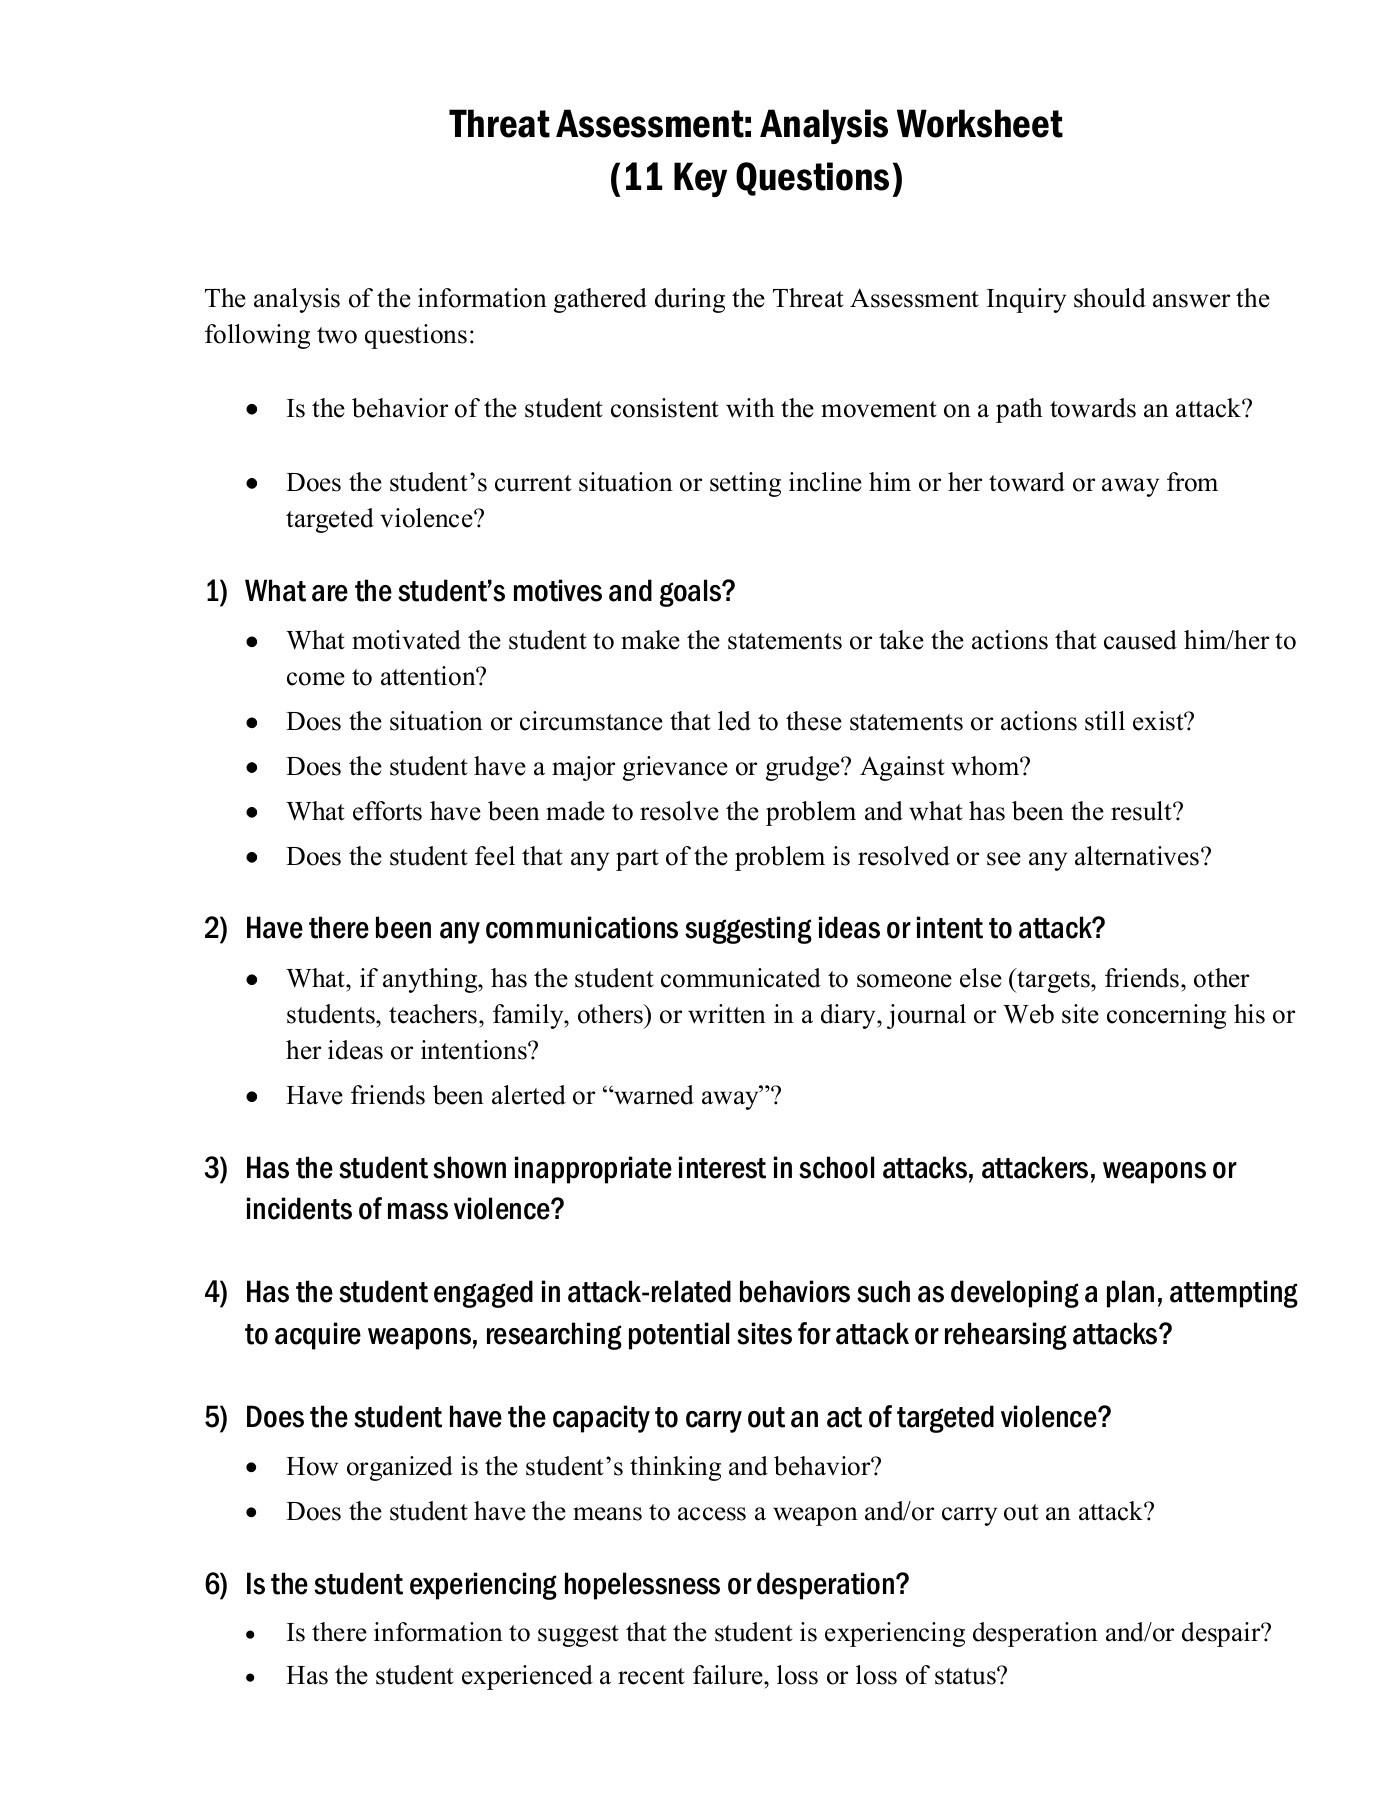 Written Document Analysis Worksheet Answers Threat assessment Analysis Worksheet 11 Key Questions